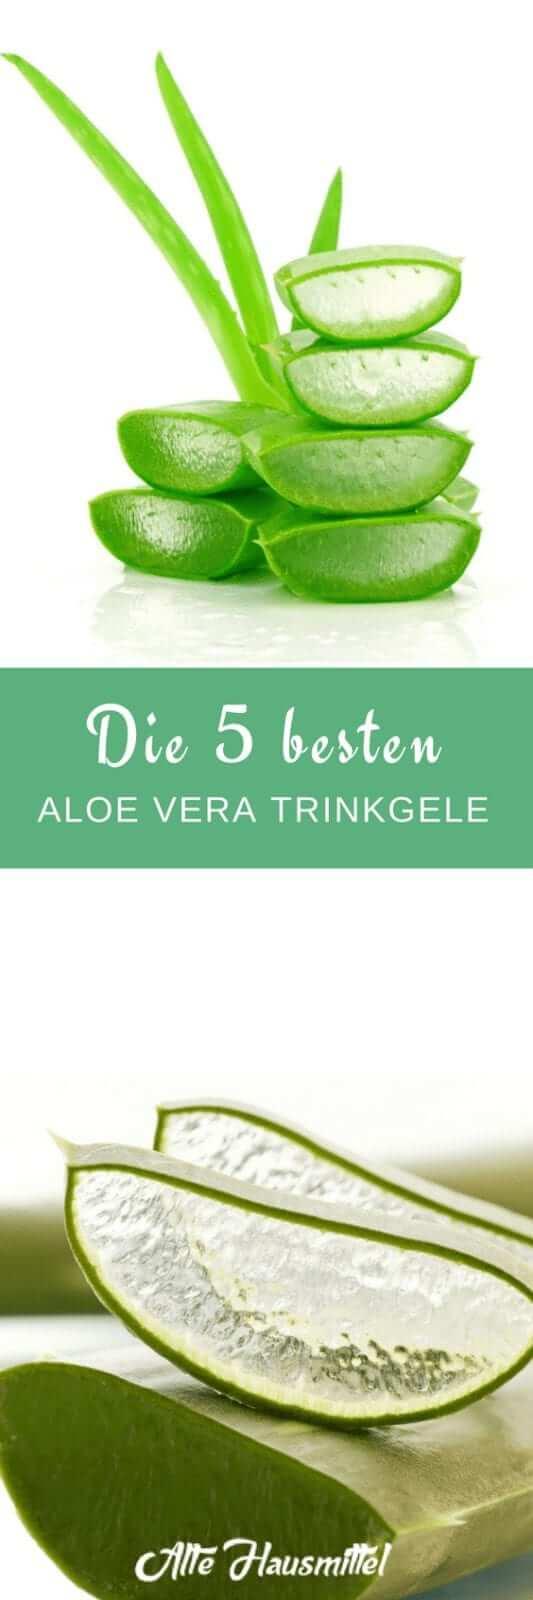 So Wählest Du das Beste Aloe Vera Trinkgel